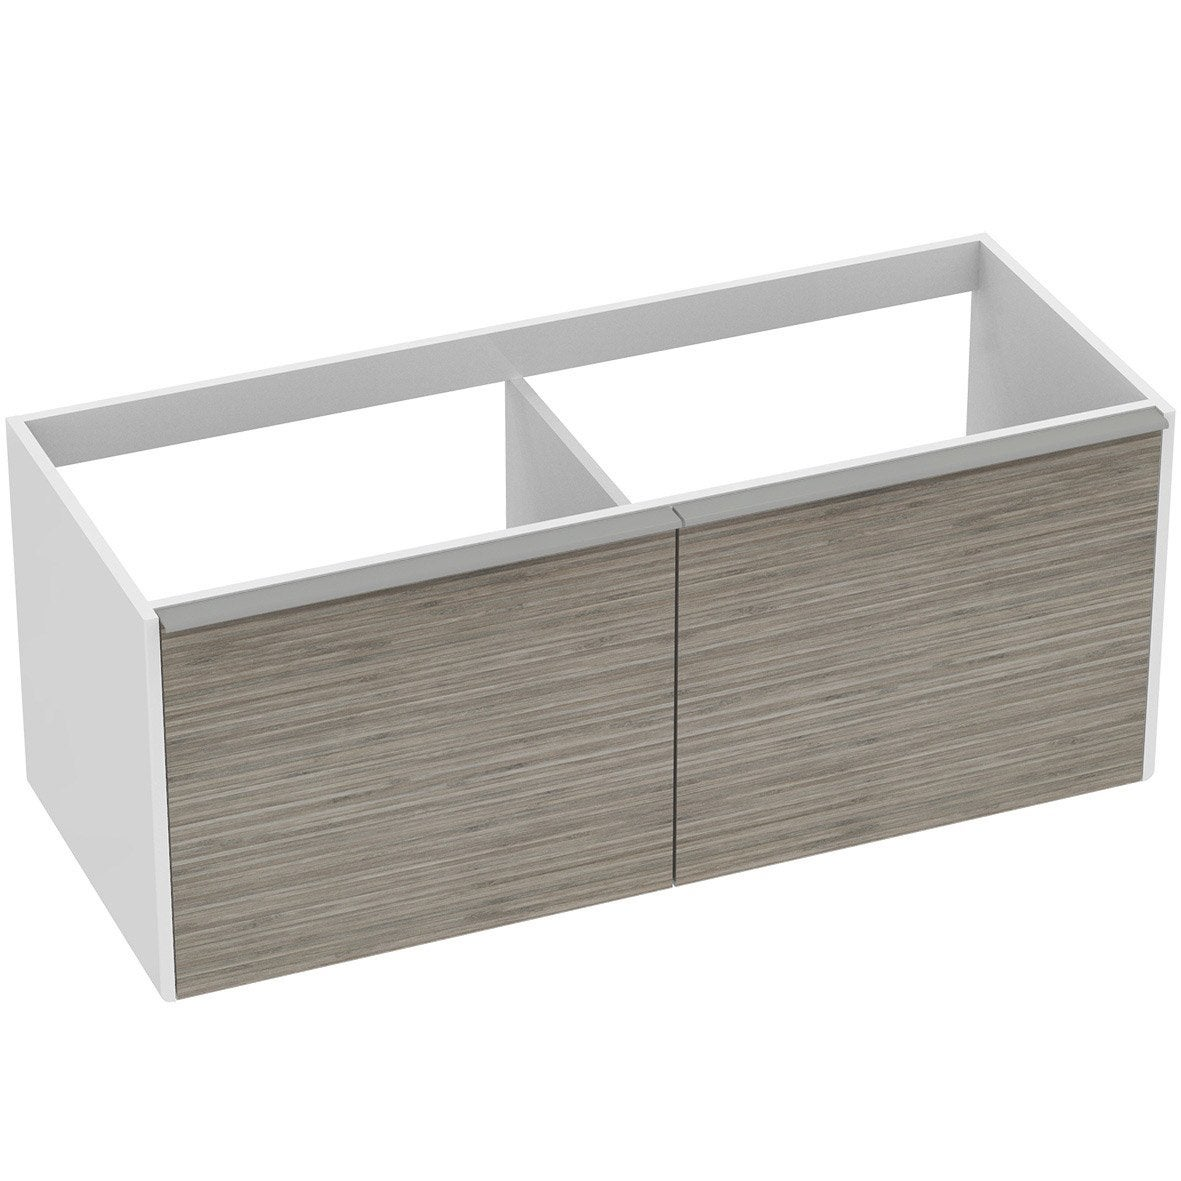 meuble sous vasque idealsmart imitation bambou l120xh48xp48cm 4 tiroirs leroy merlin. Black Bedroom Furniture Sets. Home Design Ideas